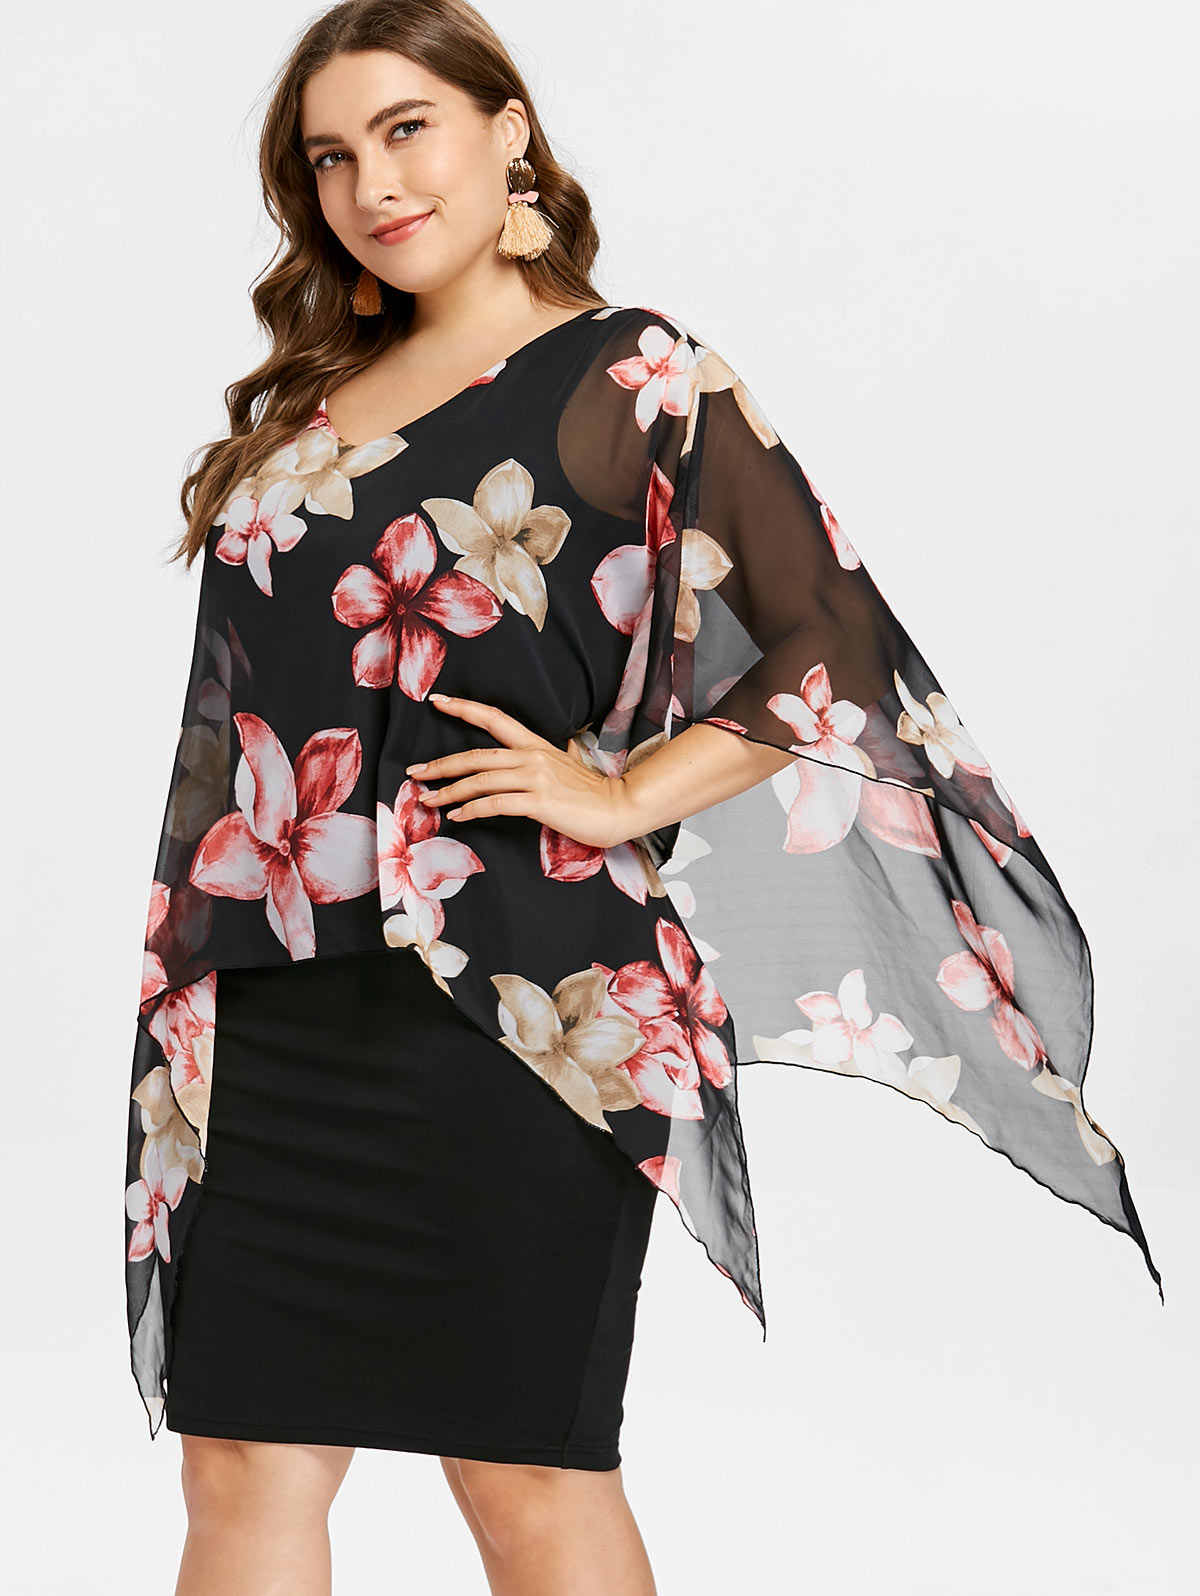 ba0b467367 Wipalo Plus Size Women Dress Plus Size Overlay Capelet Overlay Knee Length  Dress Work Party OL Dresses Vestidos De Fiesta